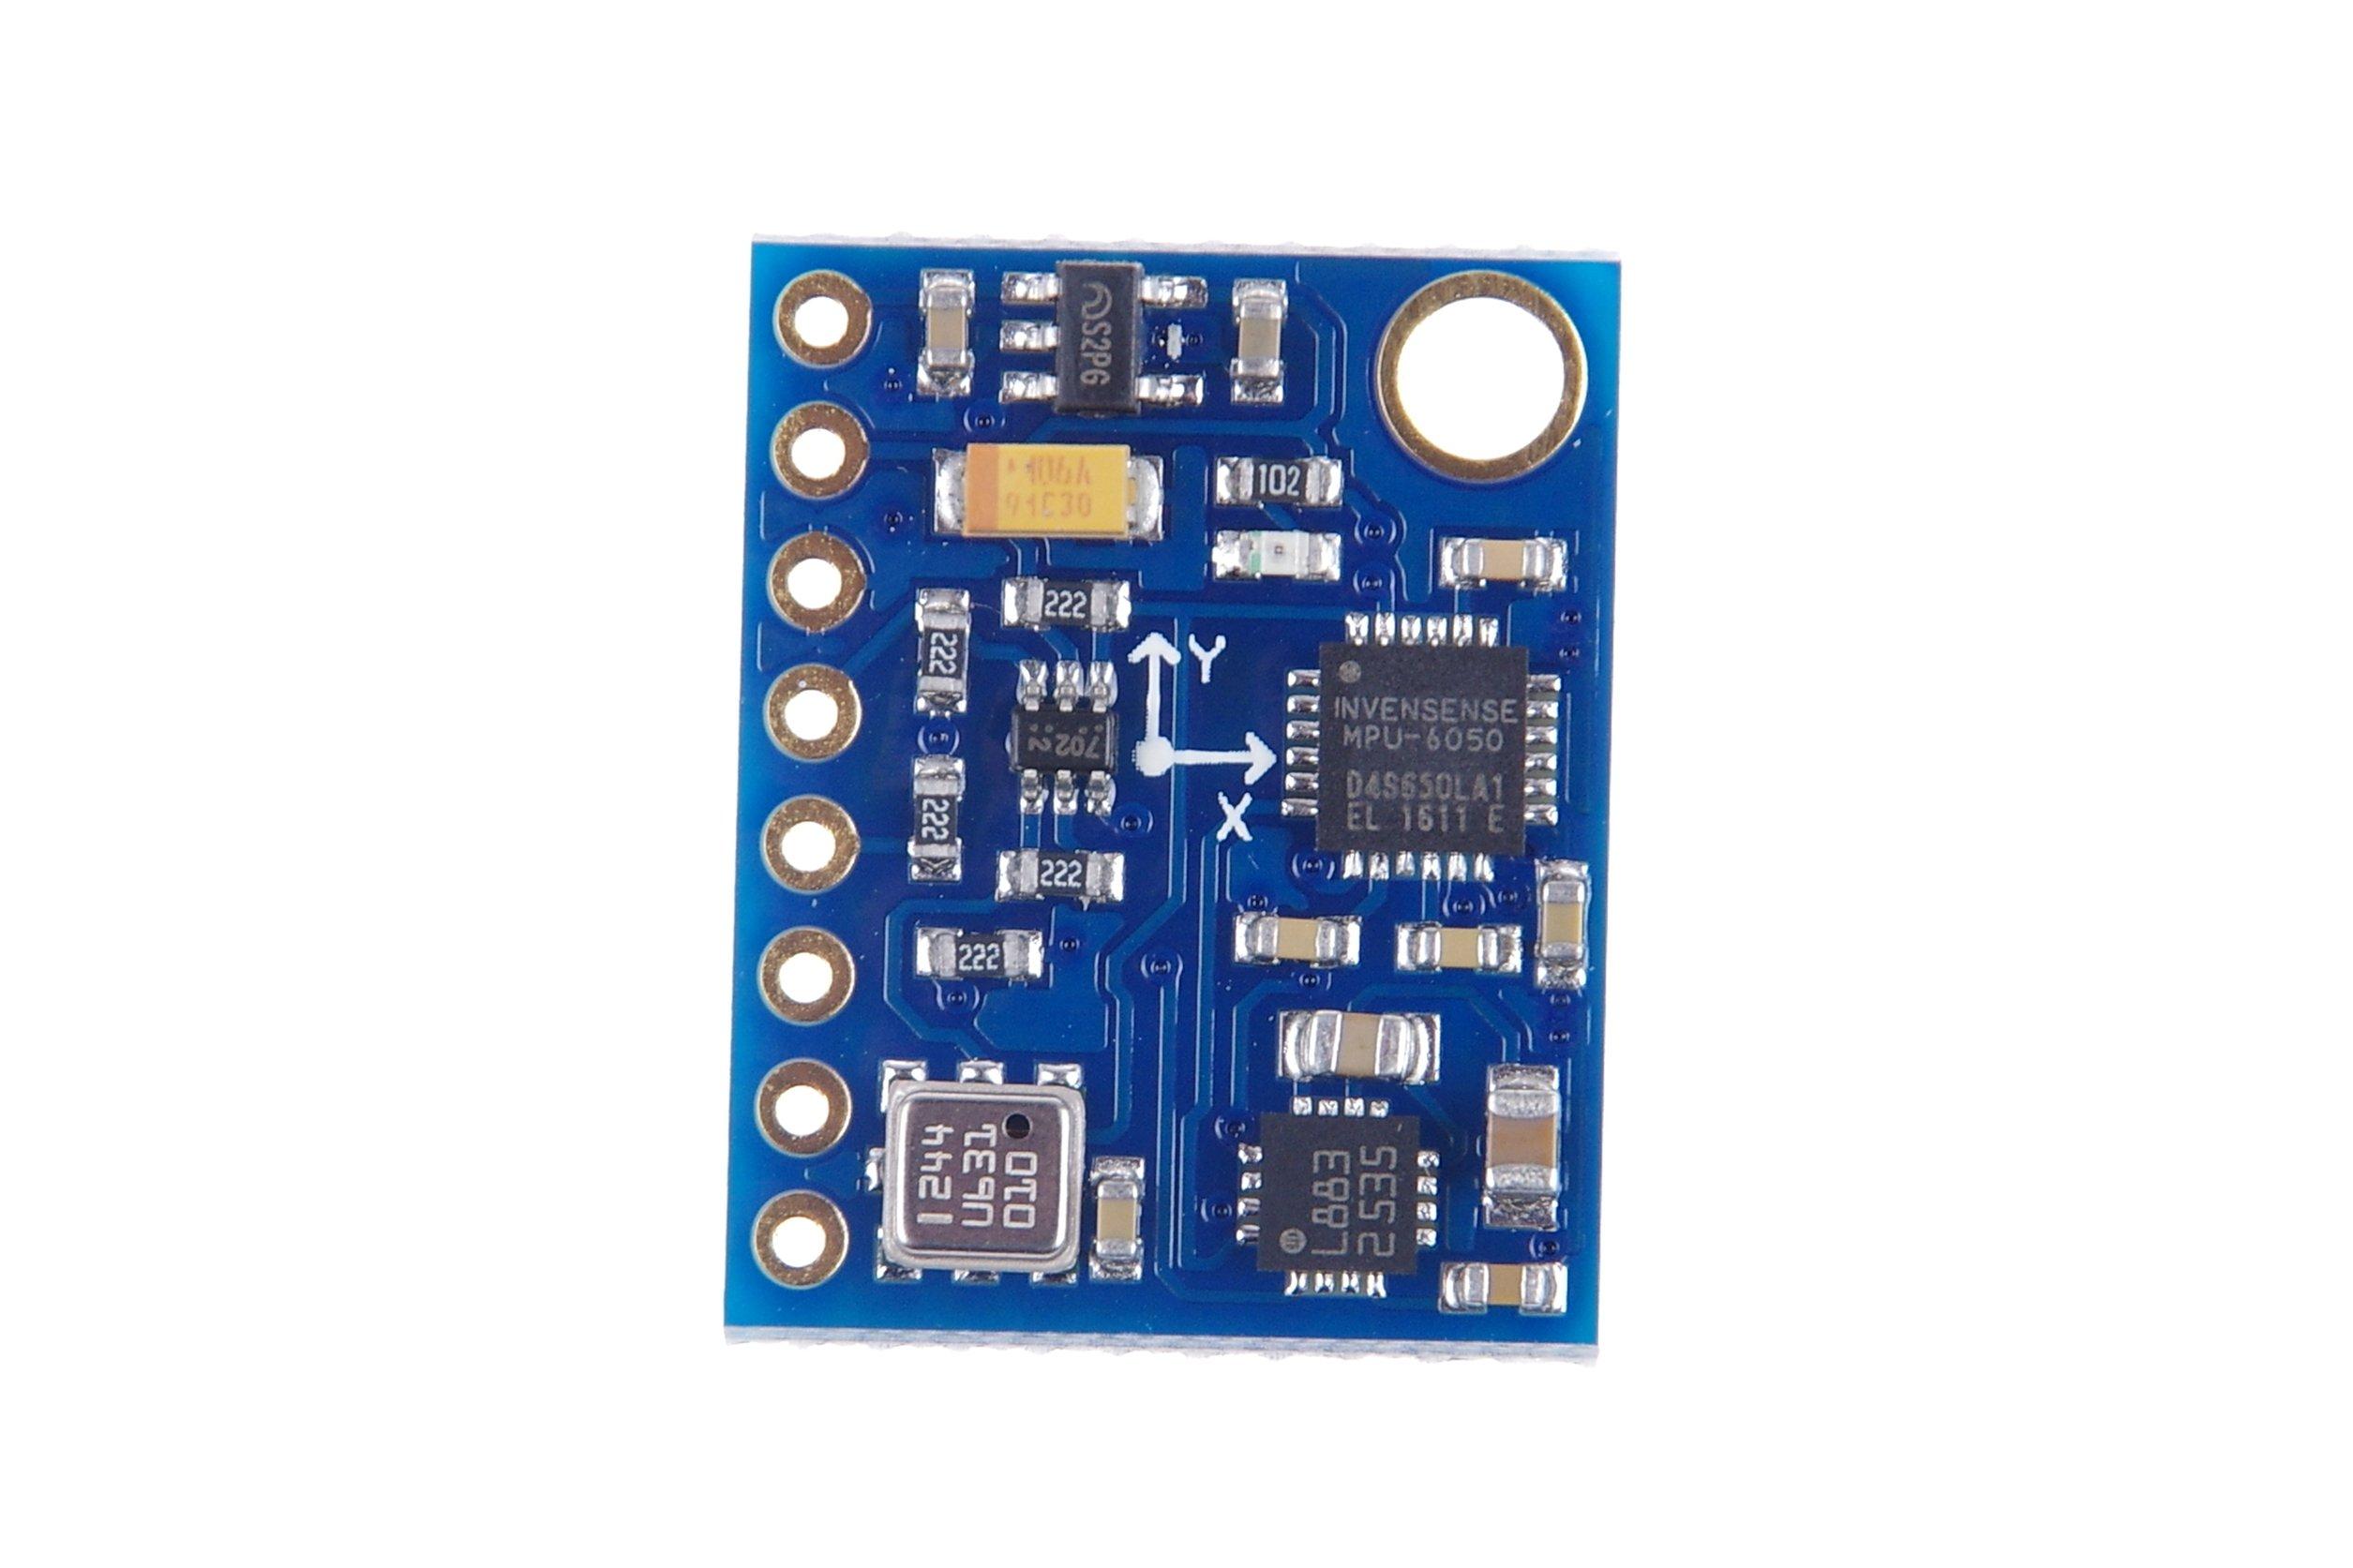 10DOF MPU6050 HMC5883L BMP180 GY-87 ACC Kompass Barom Arduino Raspberry Pi